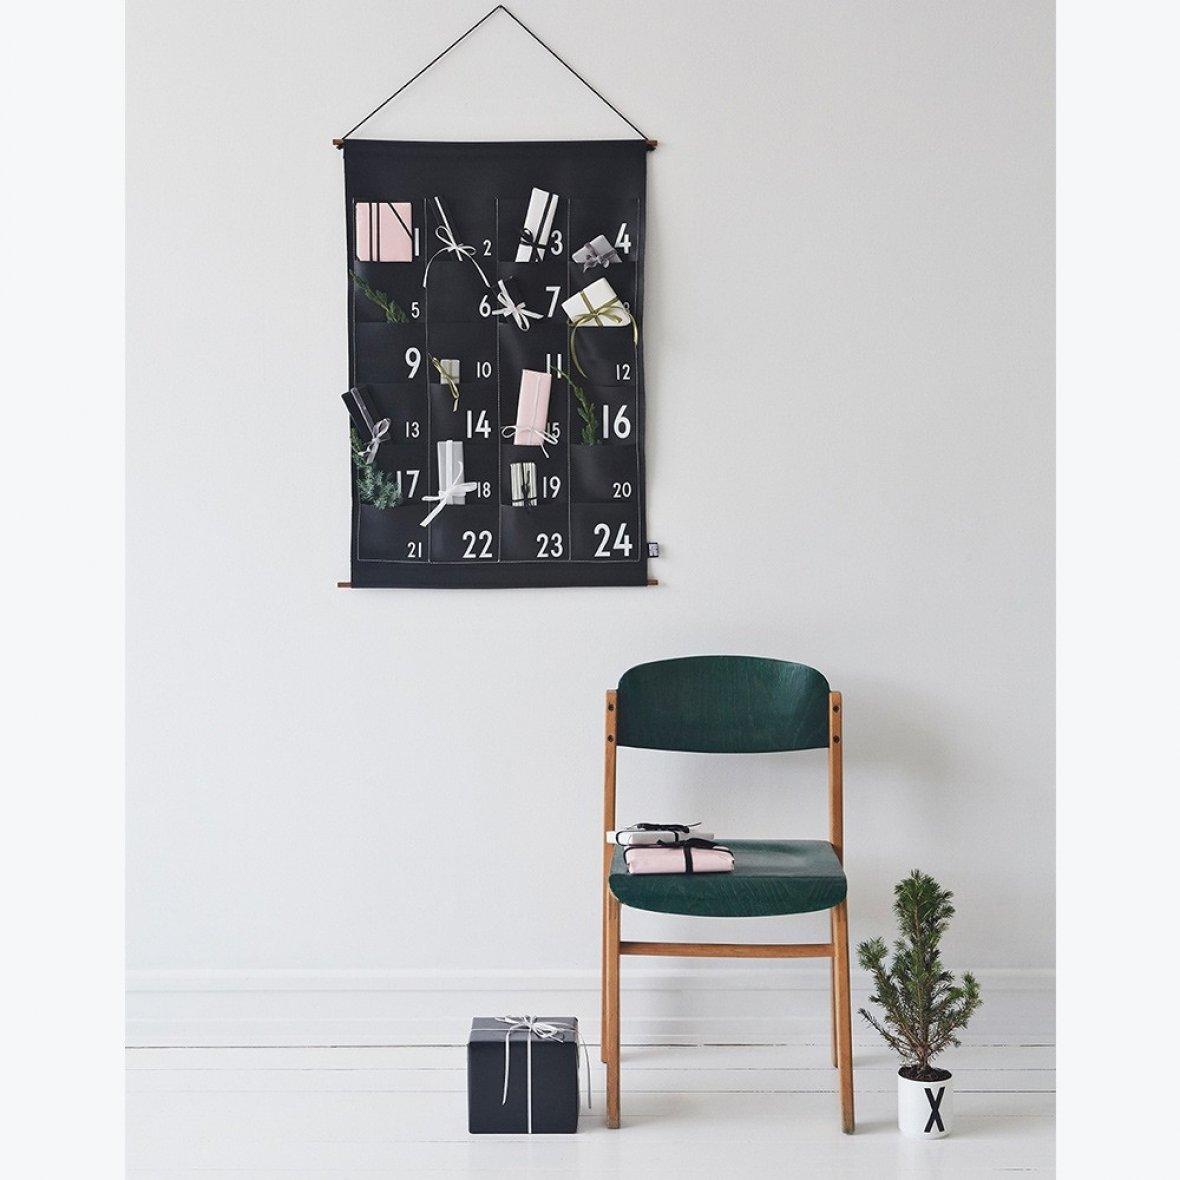 Køb stilfuldt julepynt hos KAiKU